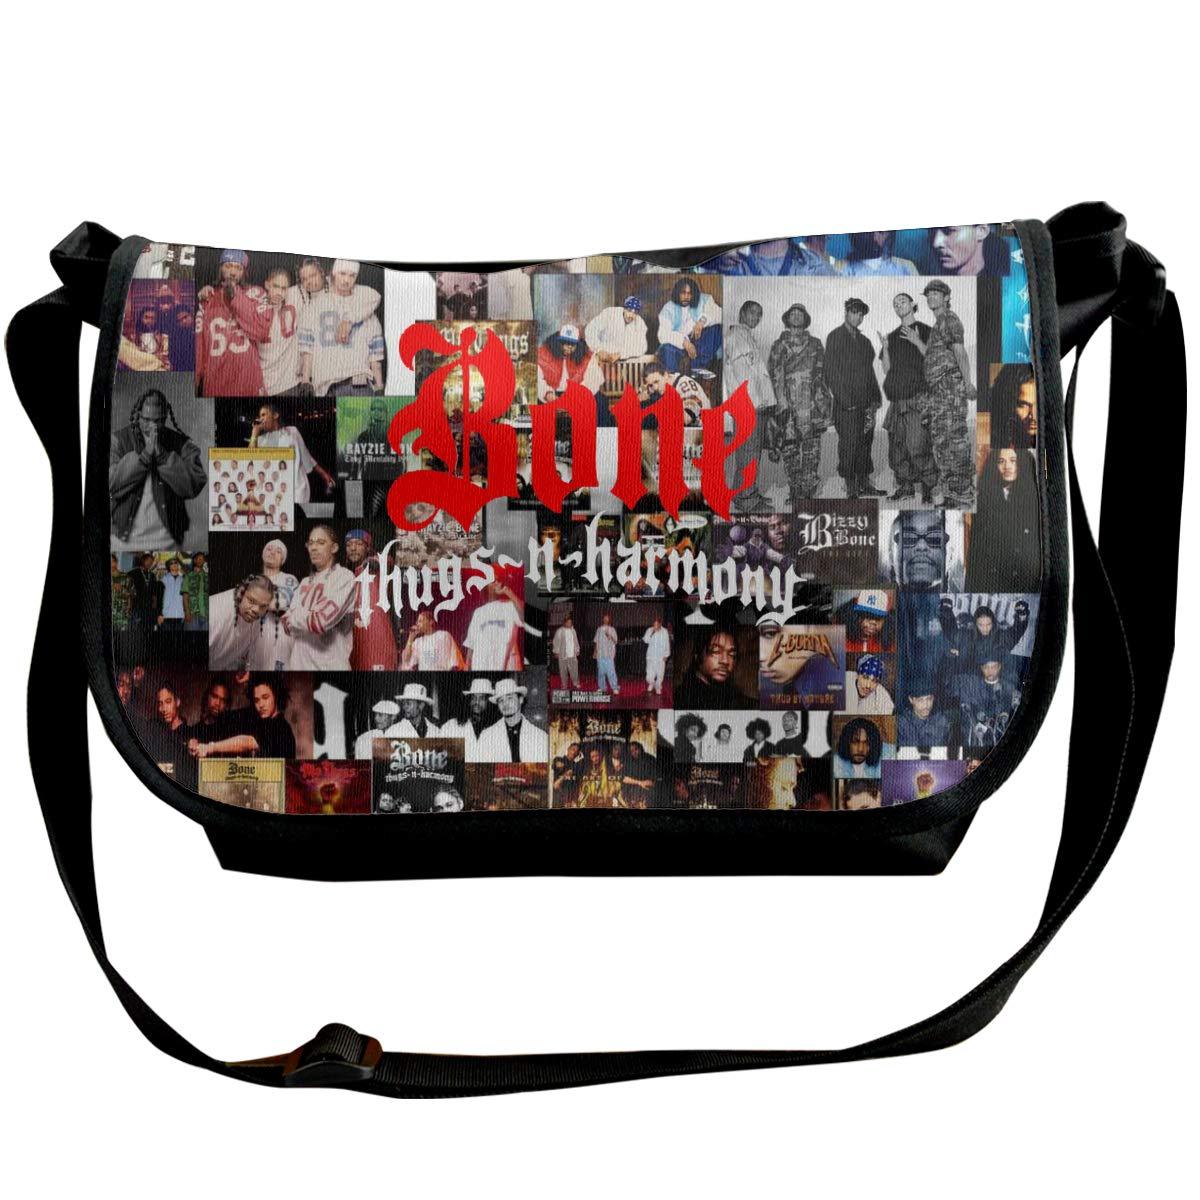 Shoulder Bag For All-Purpose Use Classic Bone Thugs N Harmony Messenger Bag